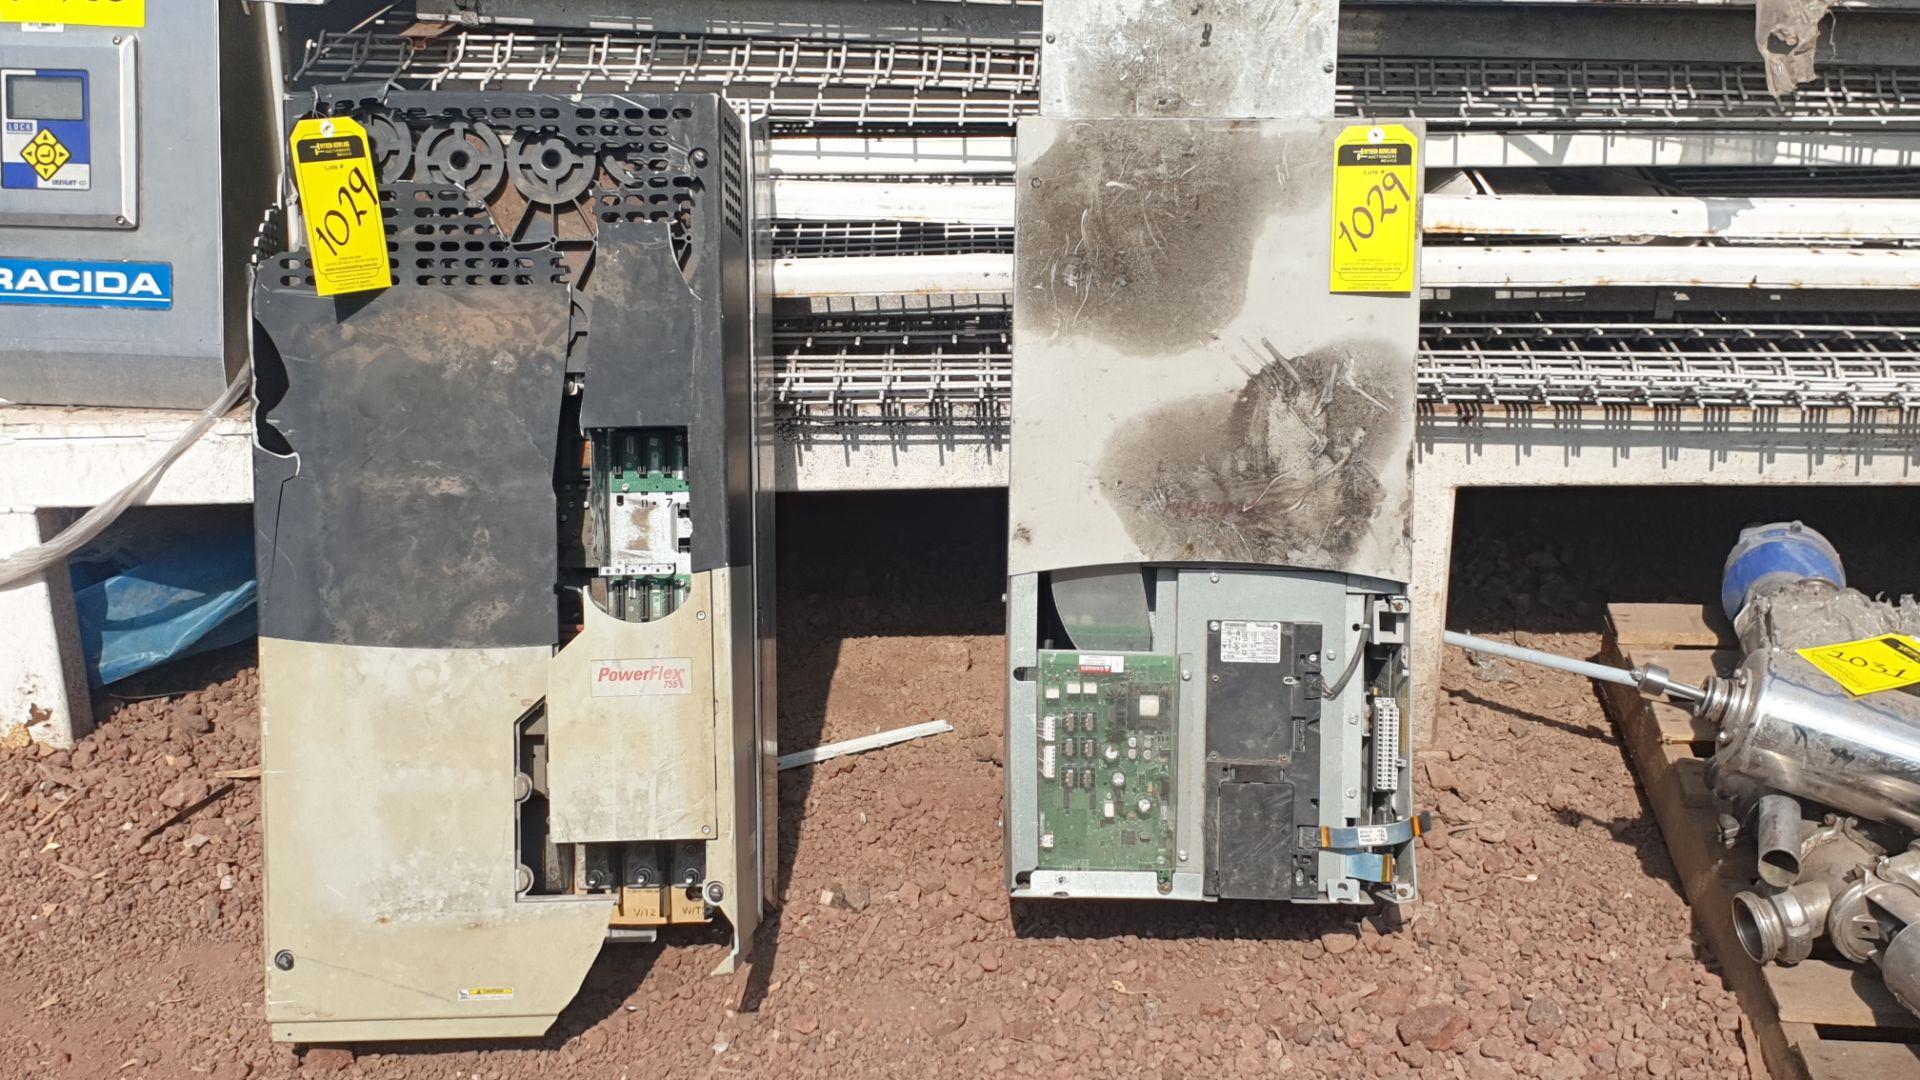 2 Powerflex Variator boards, model 20G1AN, 20BD180A0AYNANC0 - Image 3 of 13